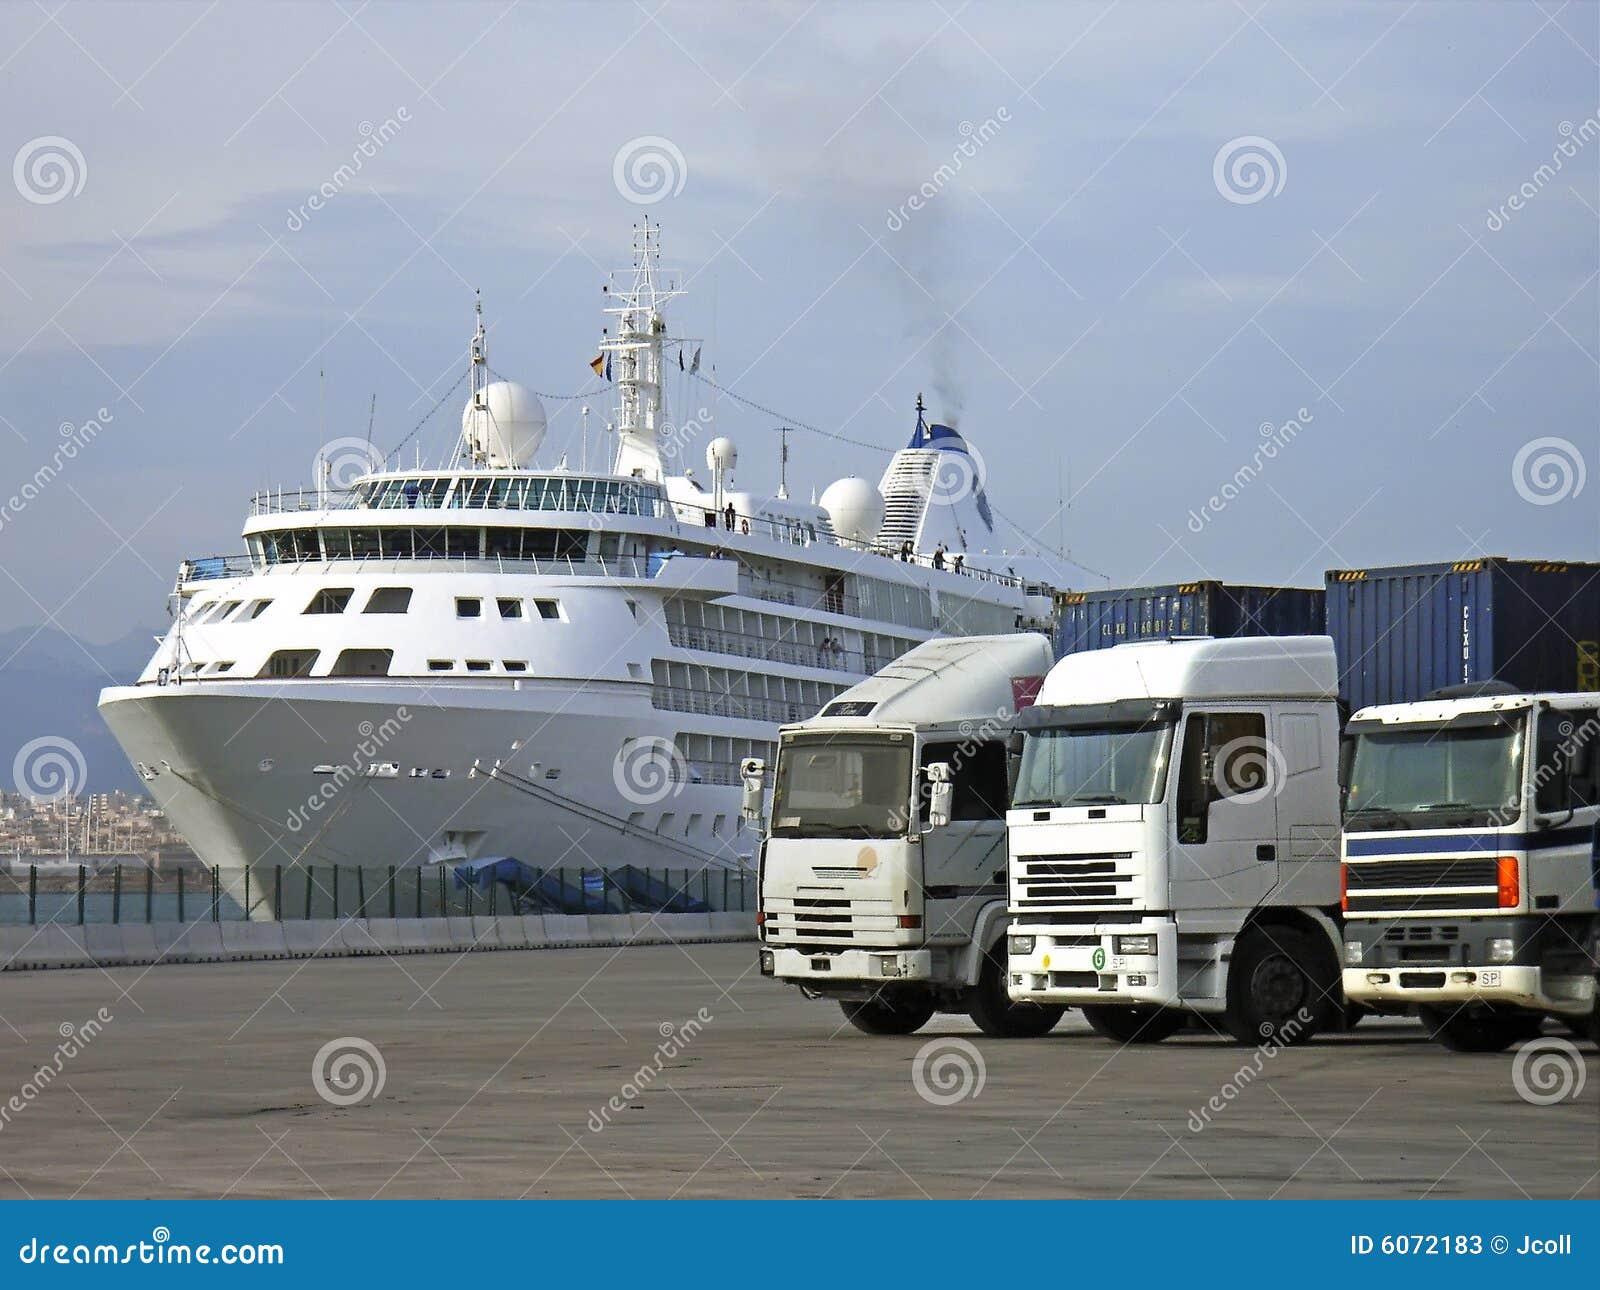 Sea and Road Transportation